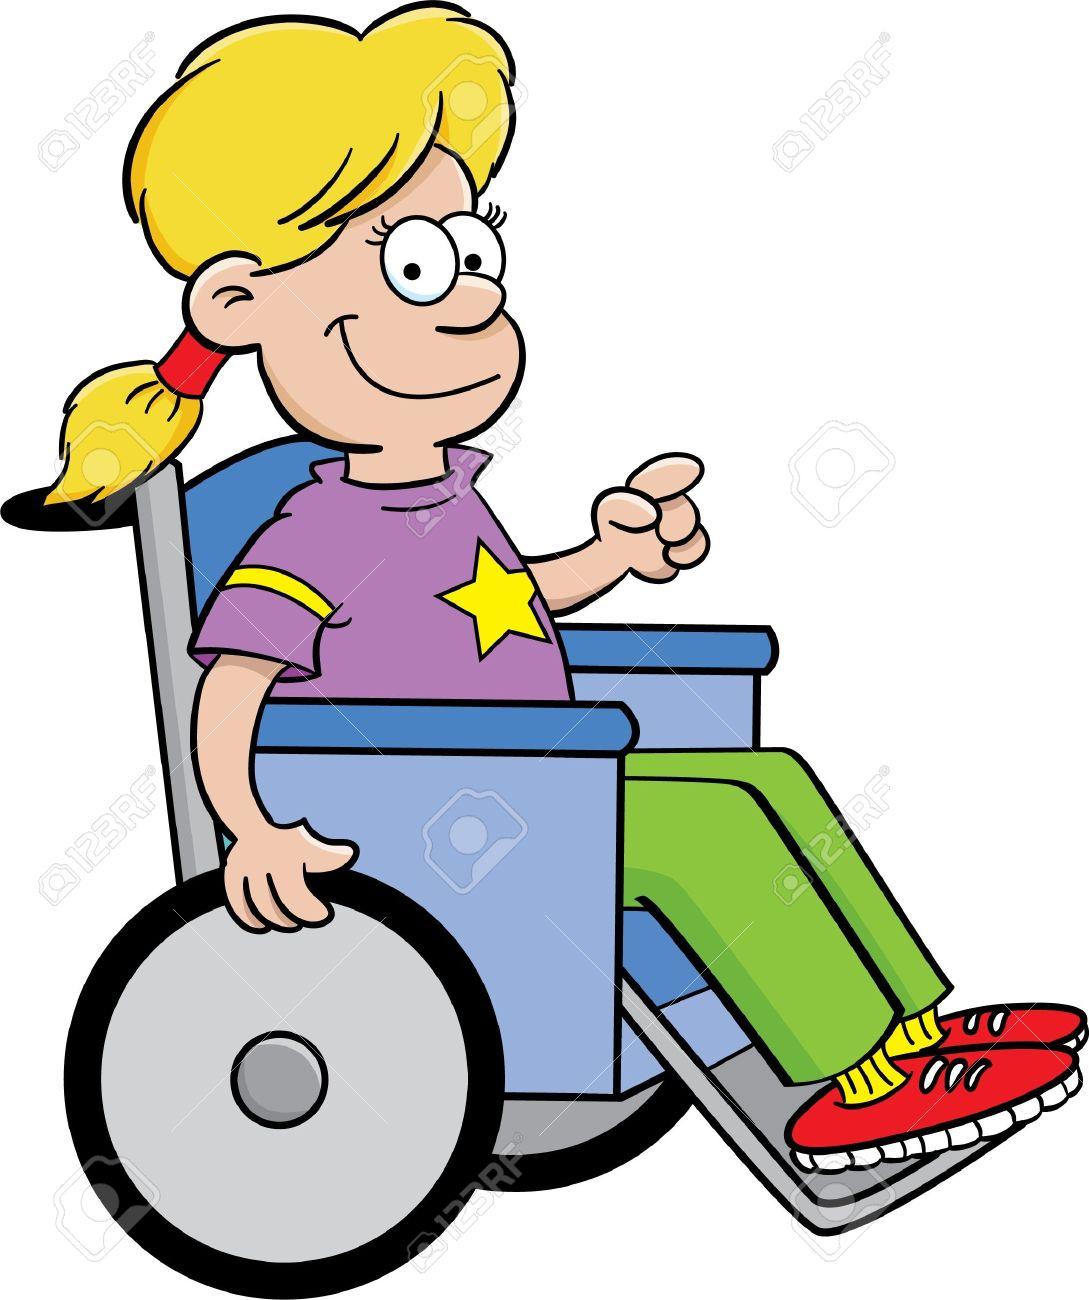 Cartoon illustration of a girl in a wheelchair Stock Vector - 14960802